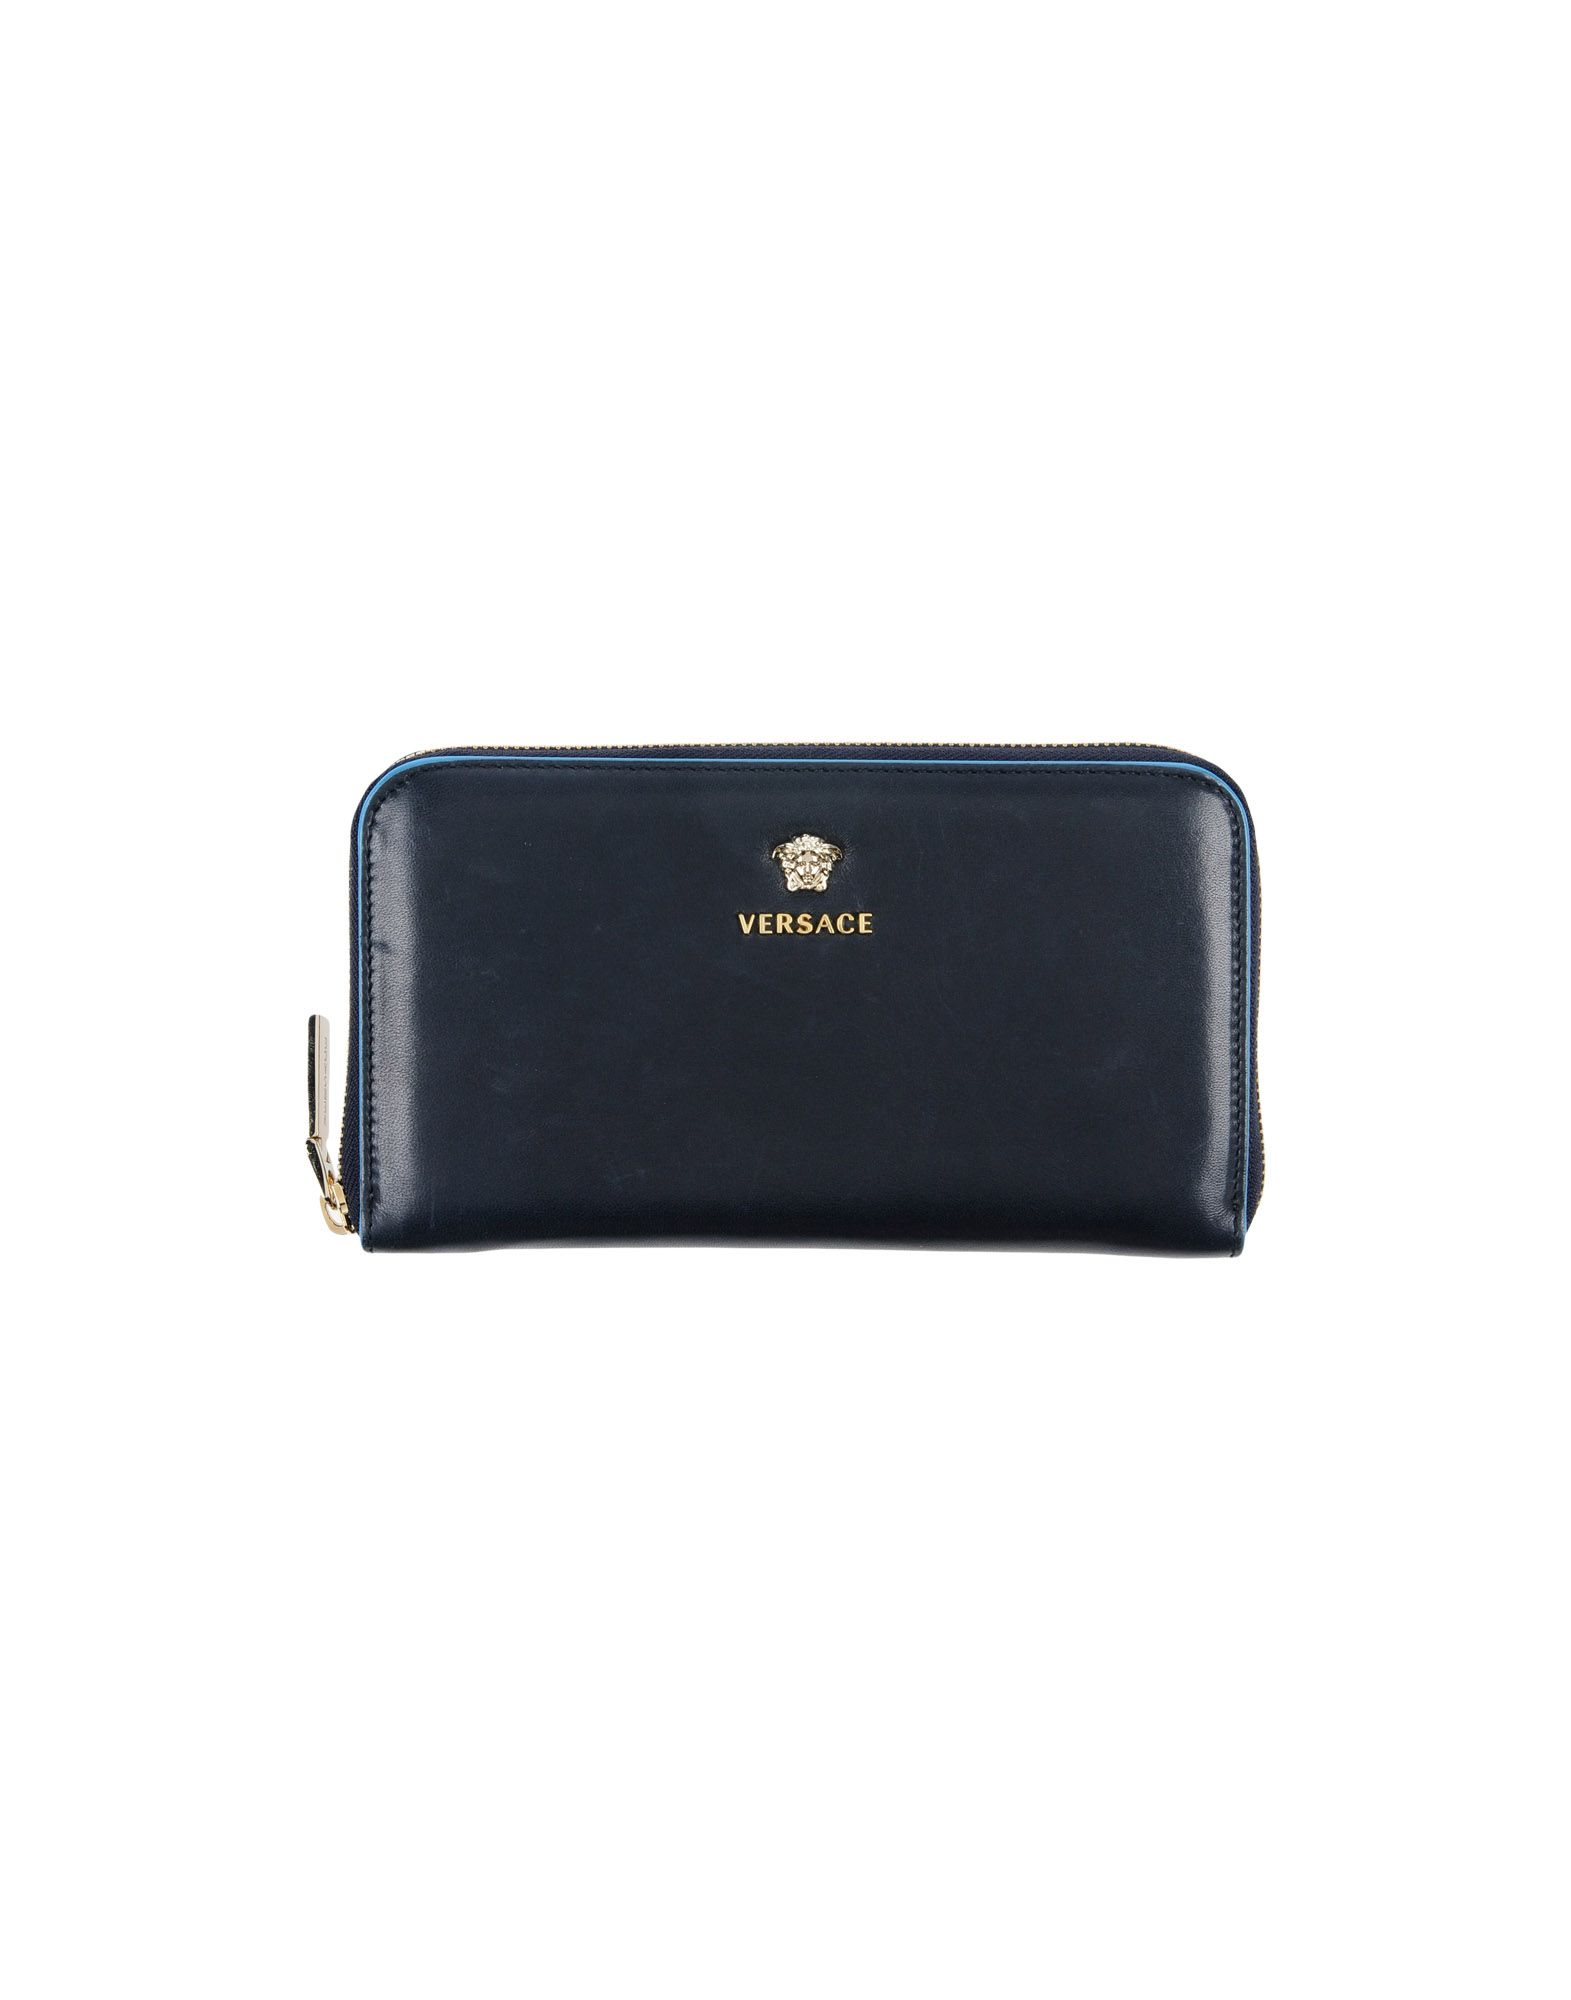 Portafoglio Versace Donna - Acquista online su